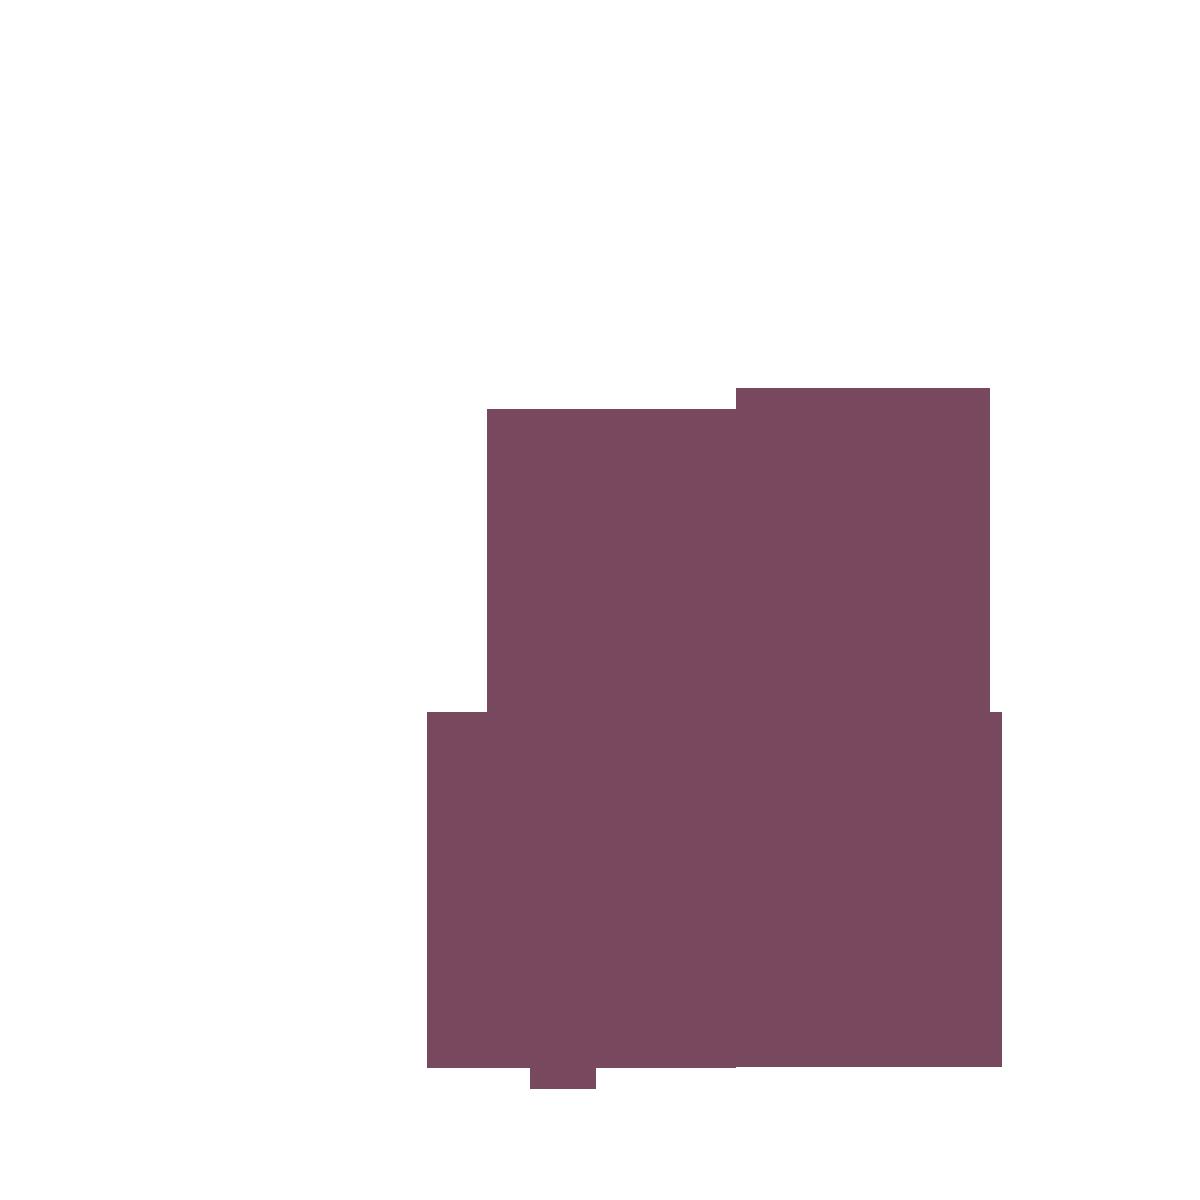 Bridesmaid silhouette clip art. Housekeeping clipart maiden